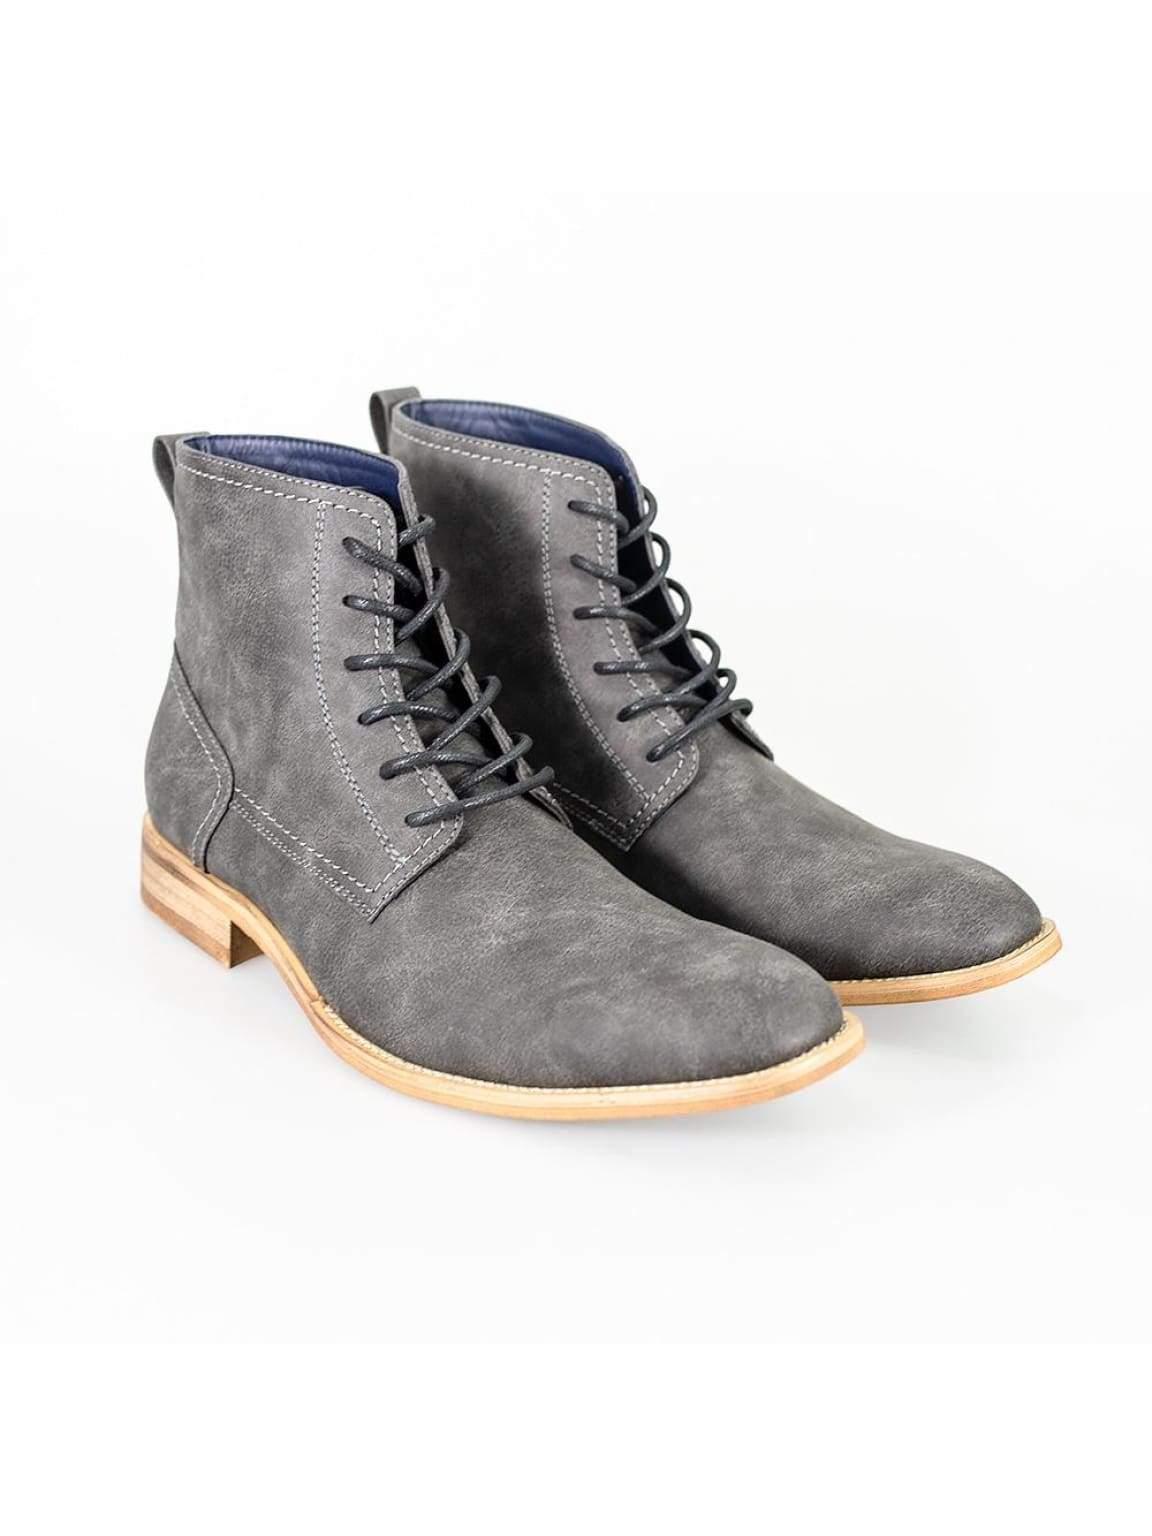 Cavani Huricane Grey Mens Leather Boots - UK7 | EU41 - Boots